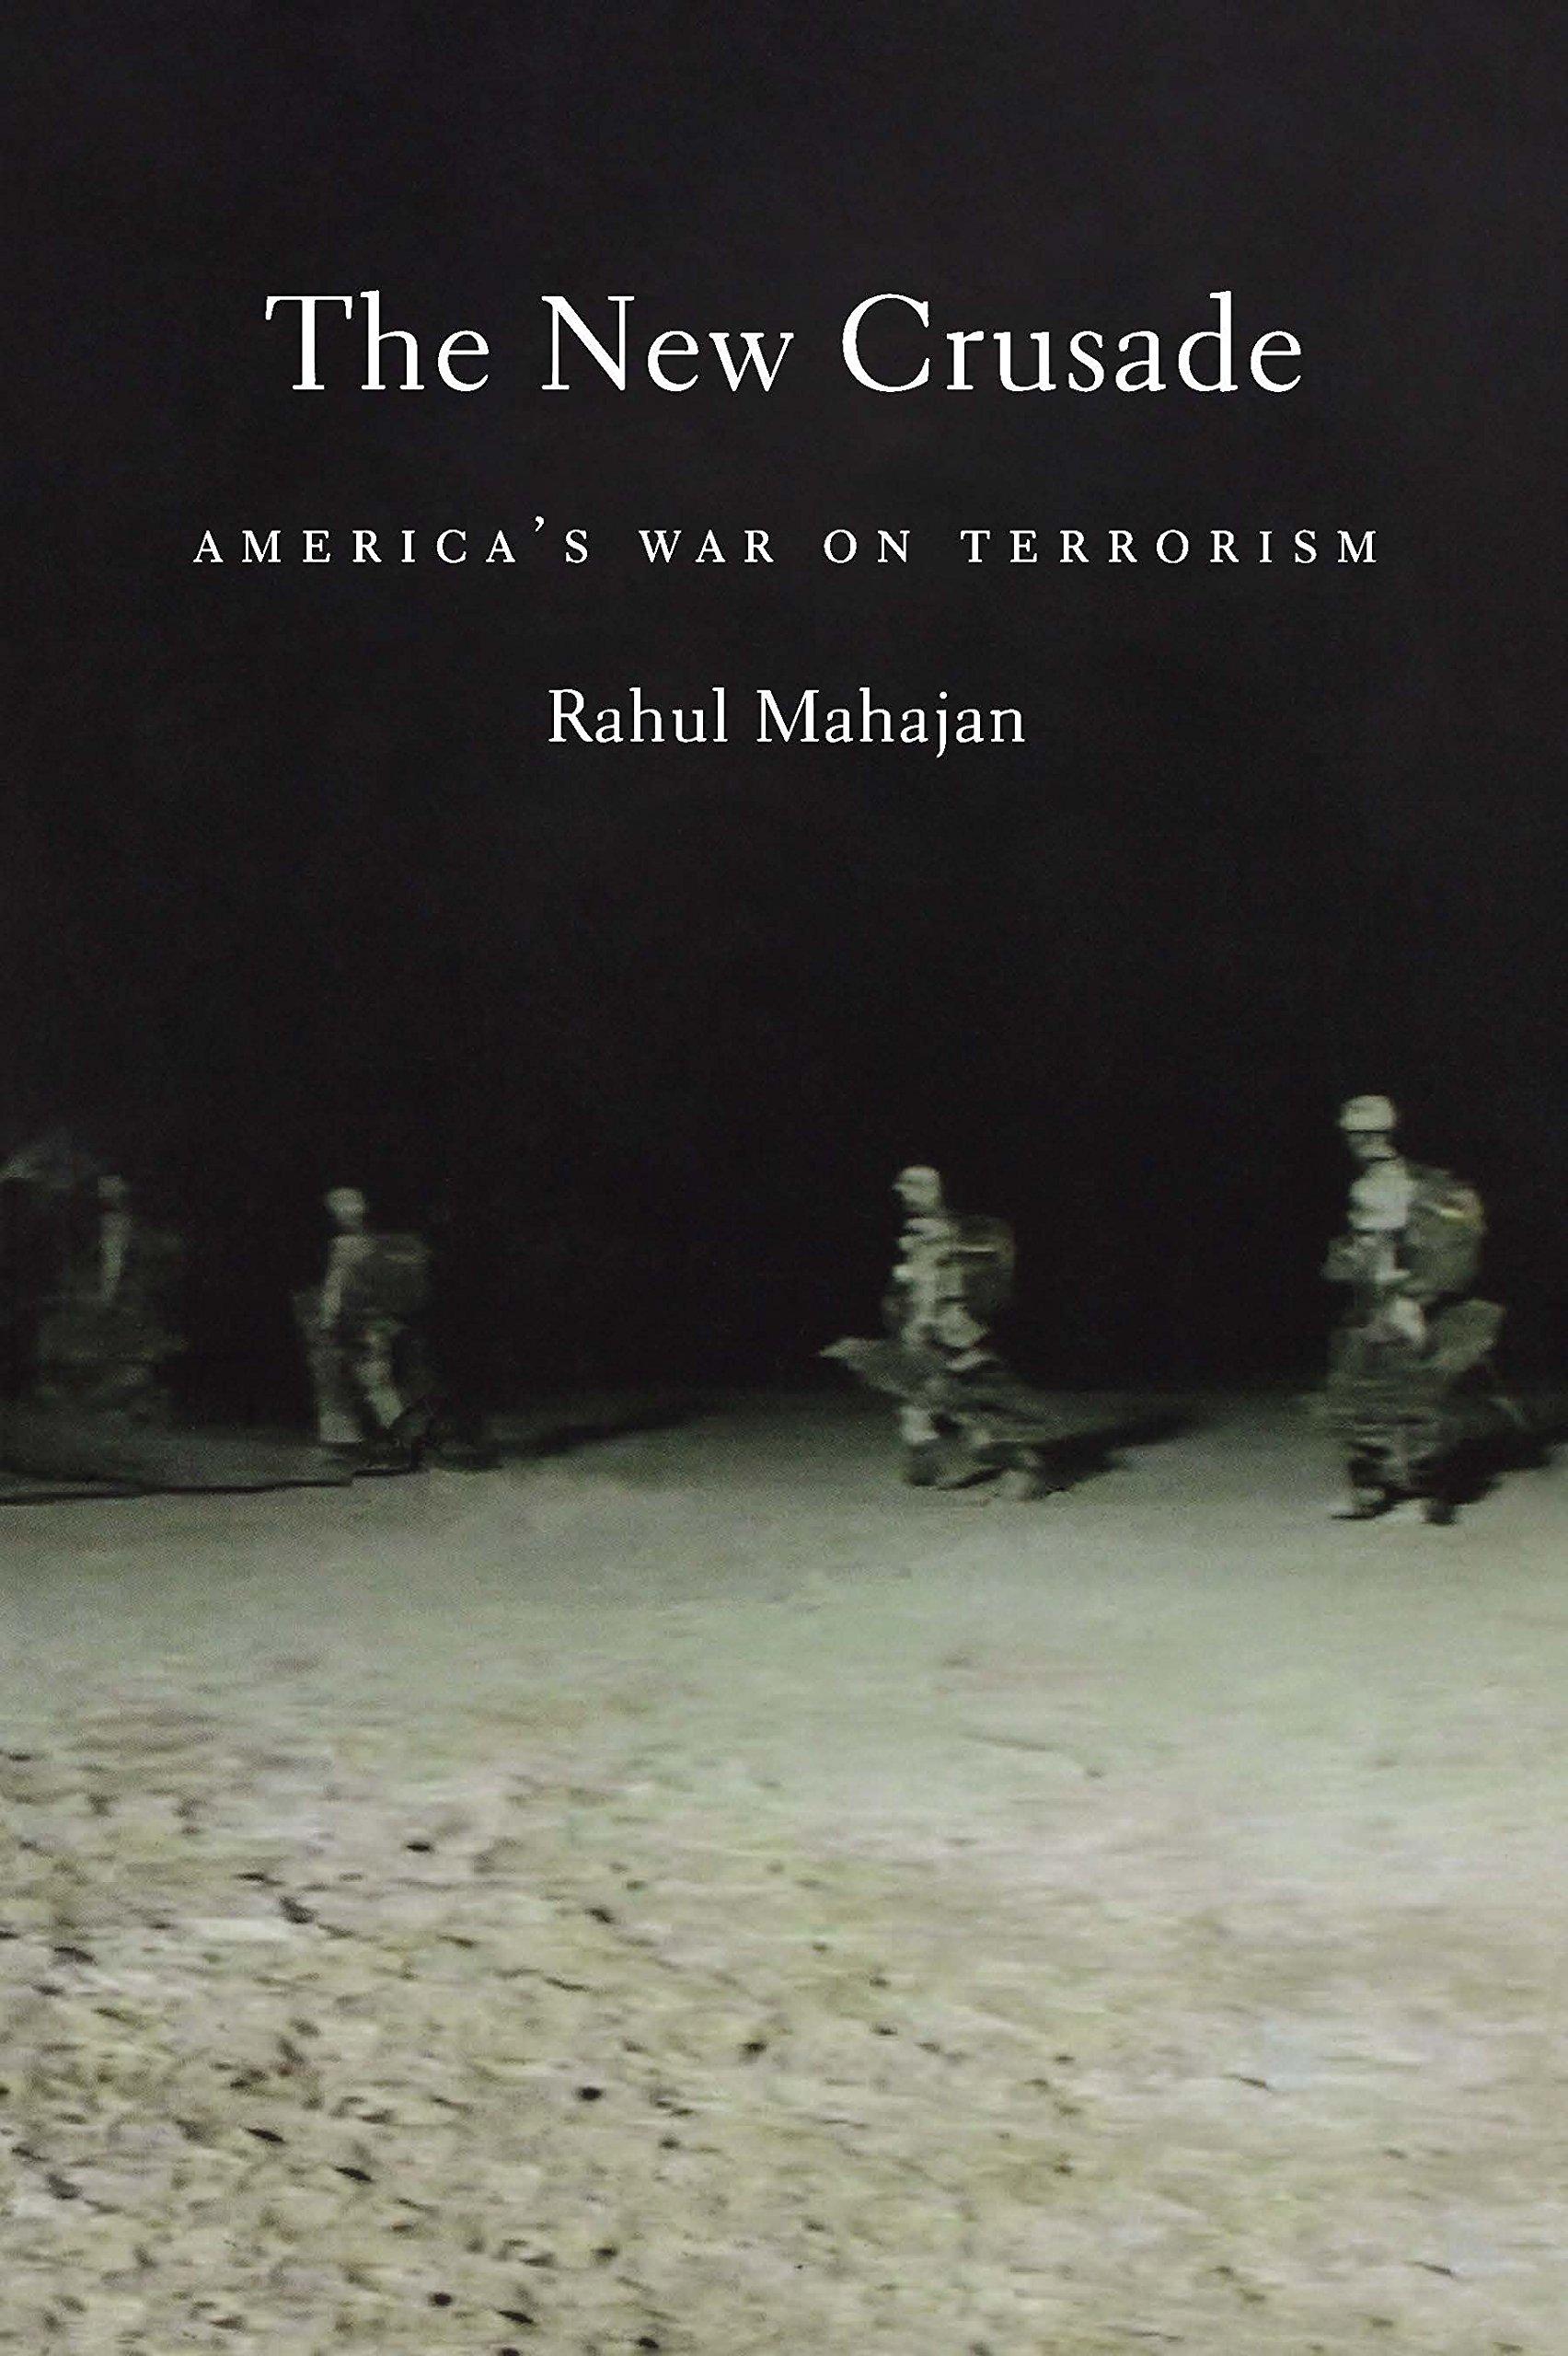 Download The New Crusade: America's War on Terrorism PDF